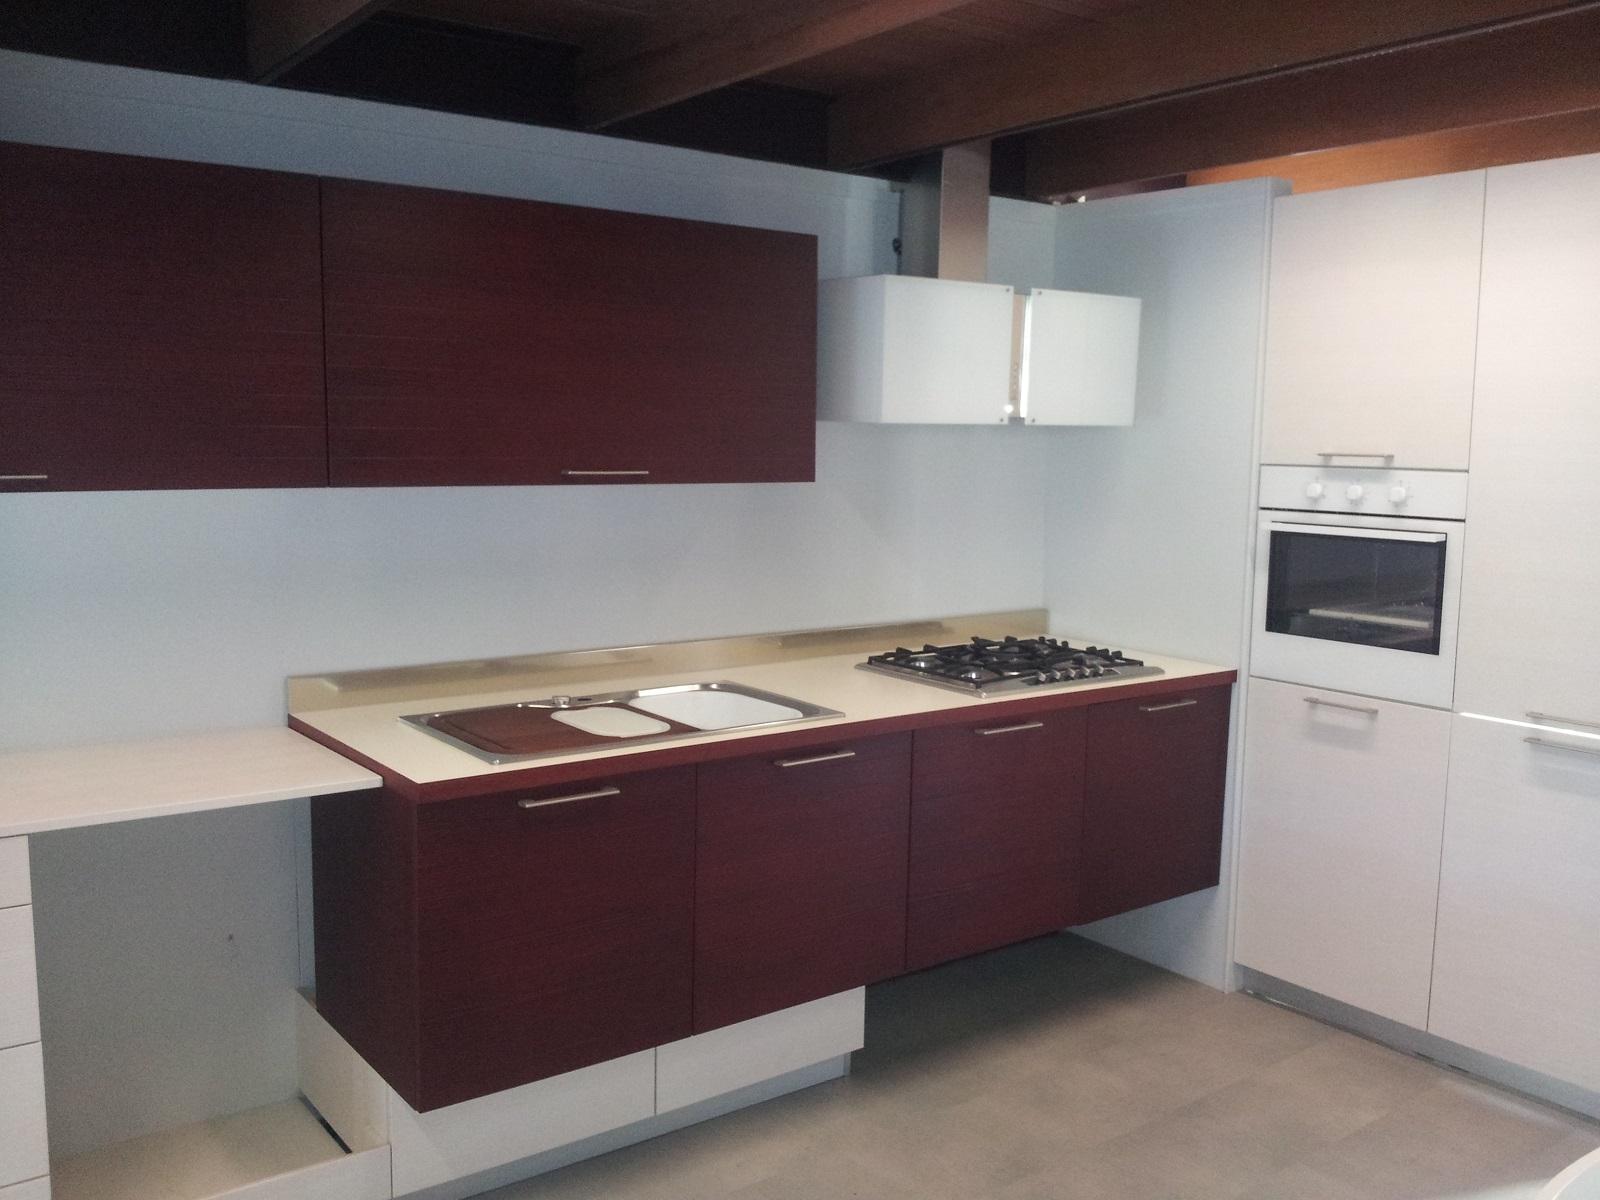 Composizione cucina in legno di larice tinto con basi sospese cucine a prezzi scontati - Cucine sospese da terra ...